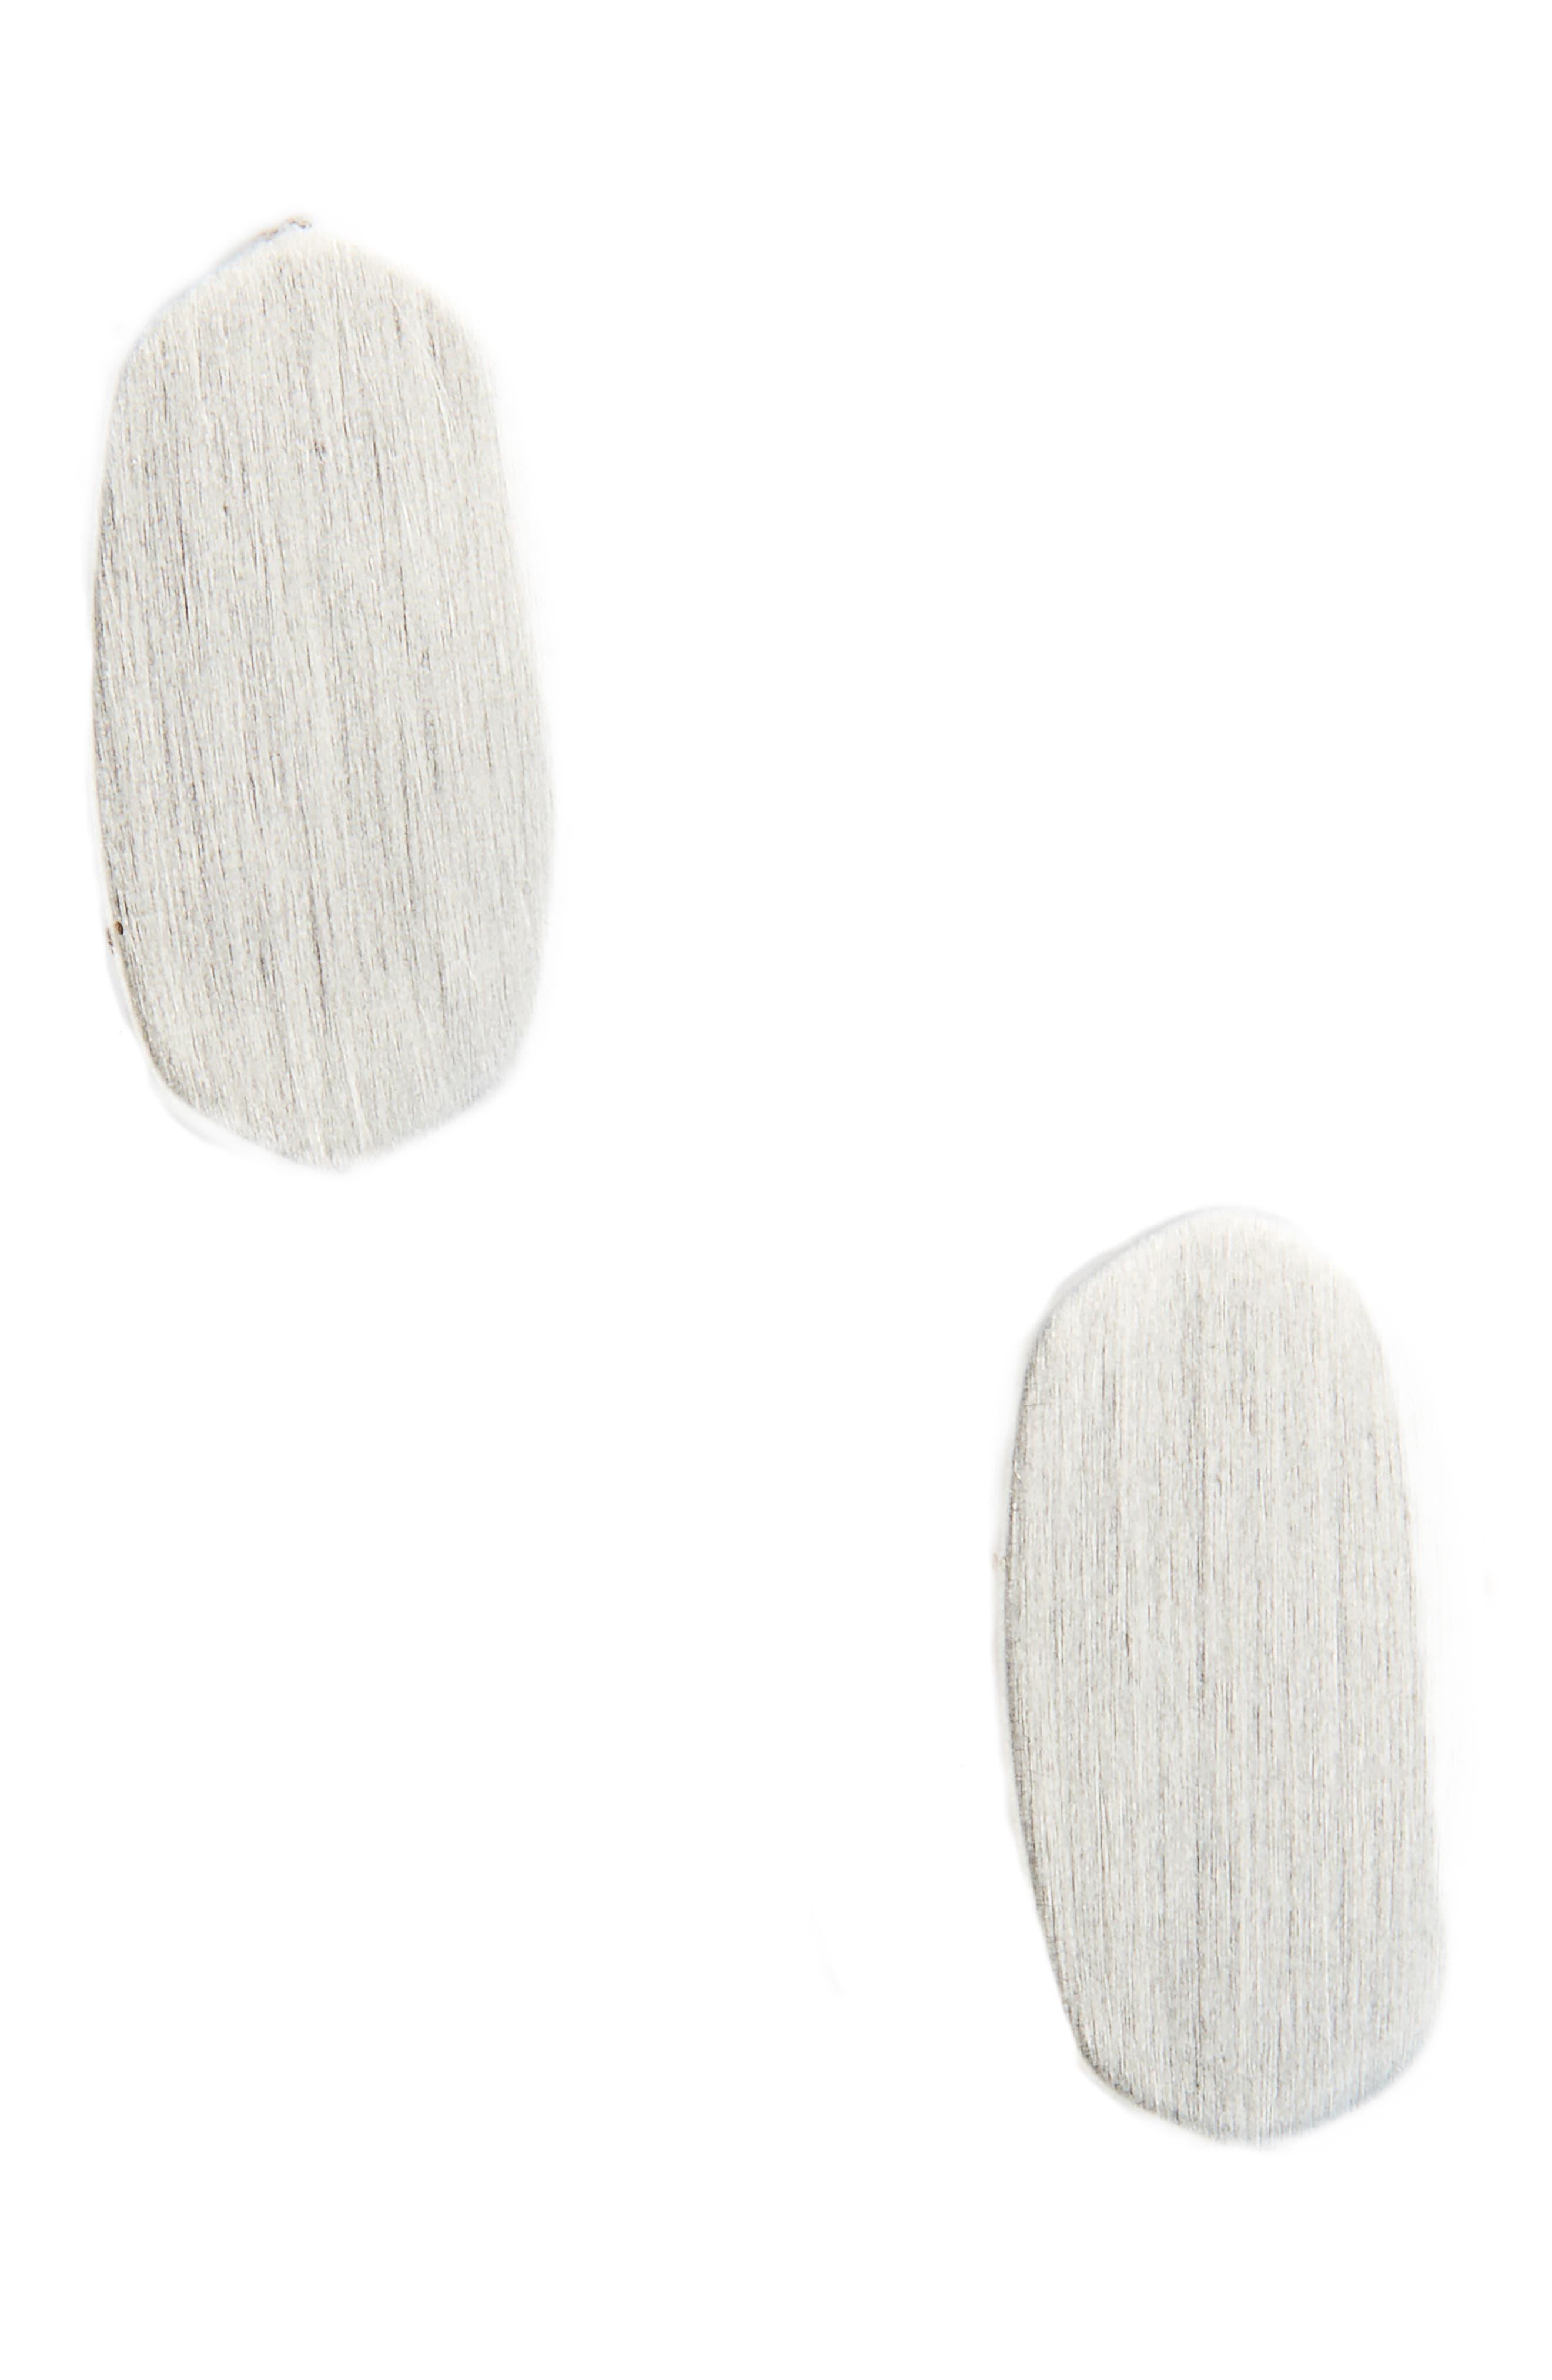 KENDRA SCOTT Barrett Stud Earrings, Main, color, BRIGHT SILVER